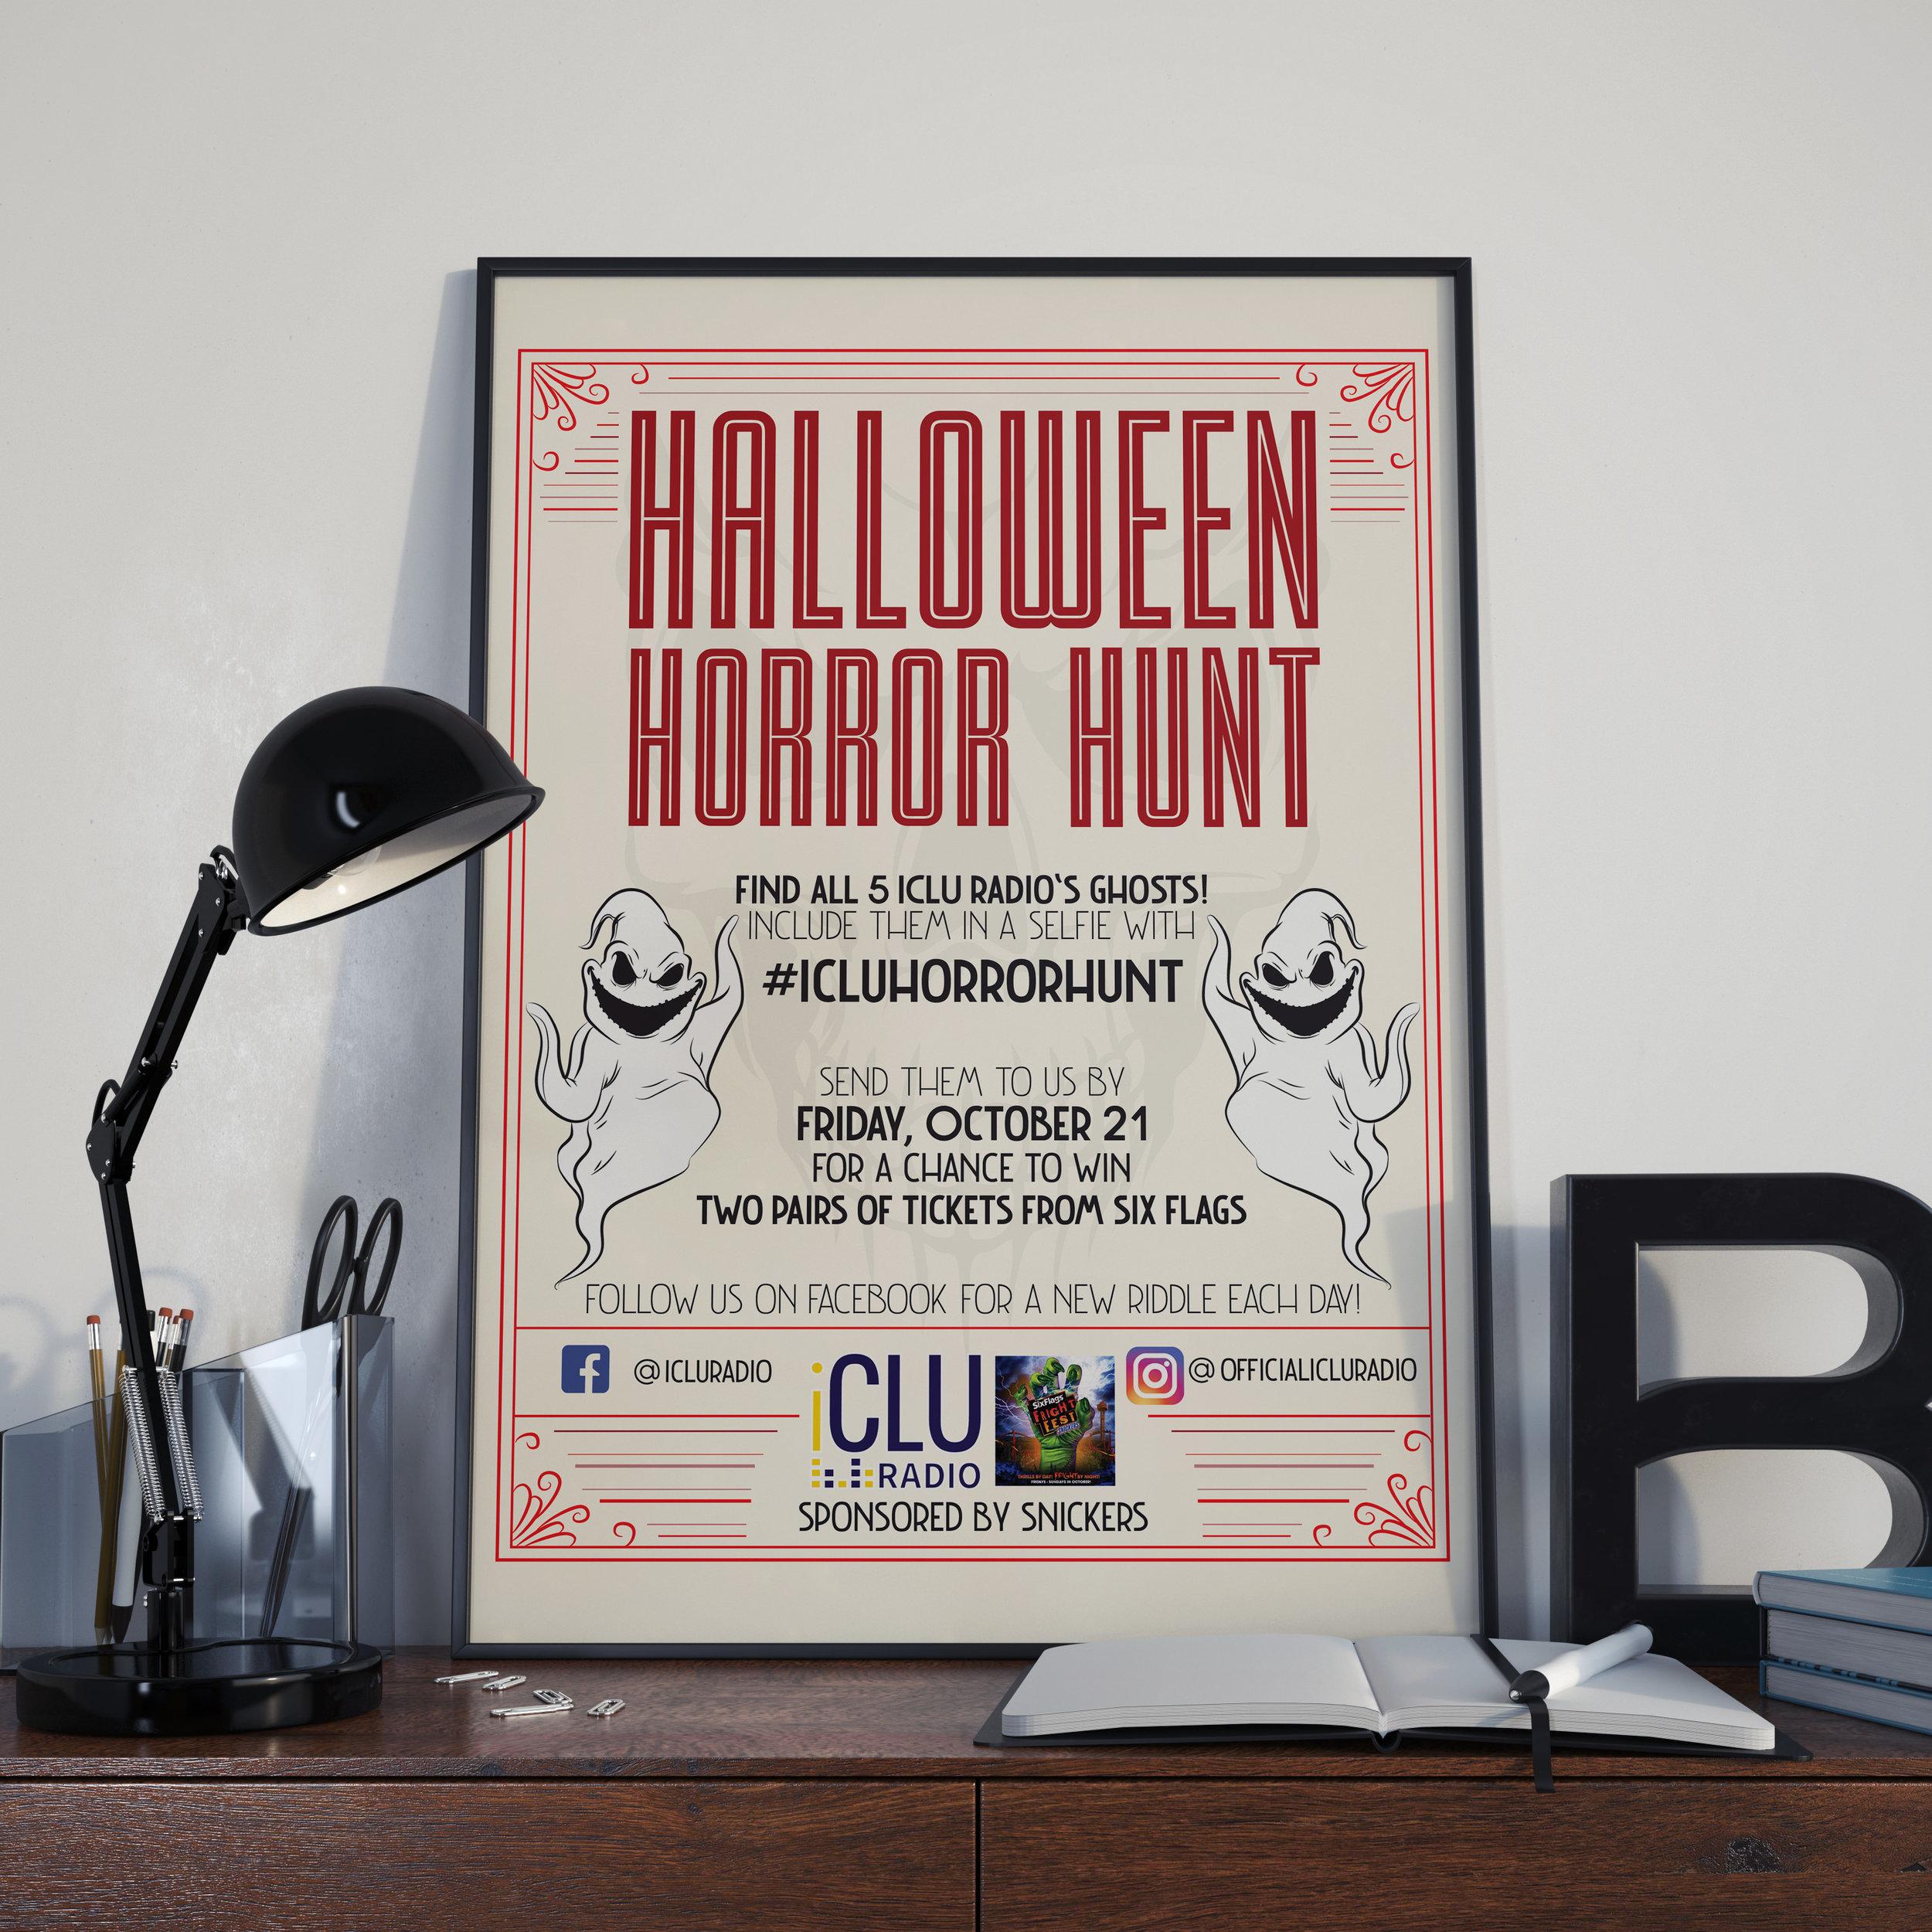 Halloween Horror Night.jpg